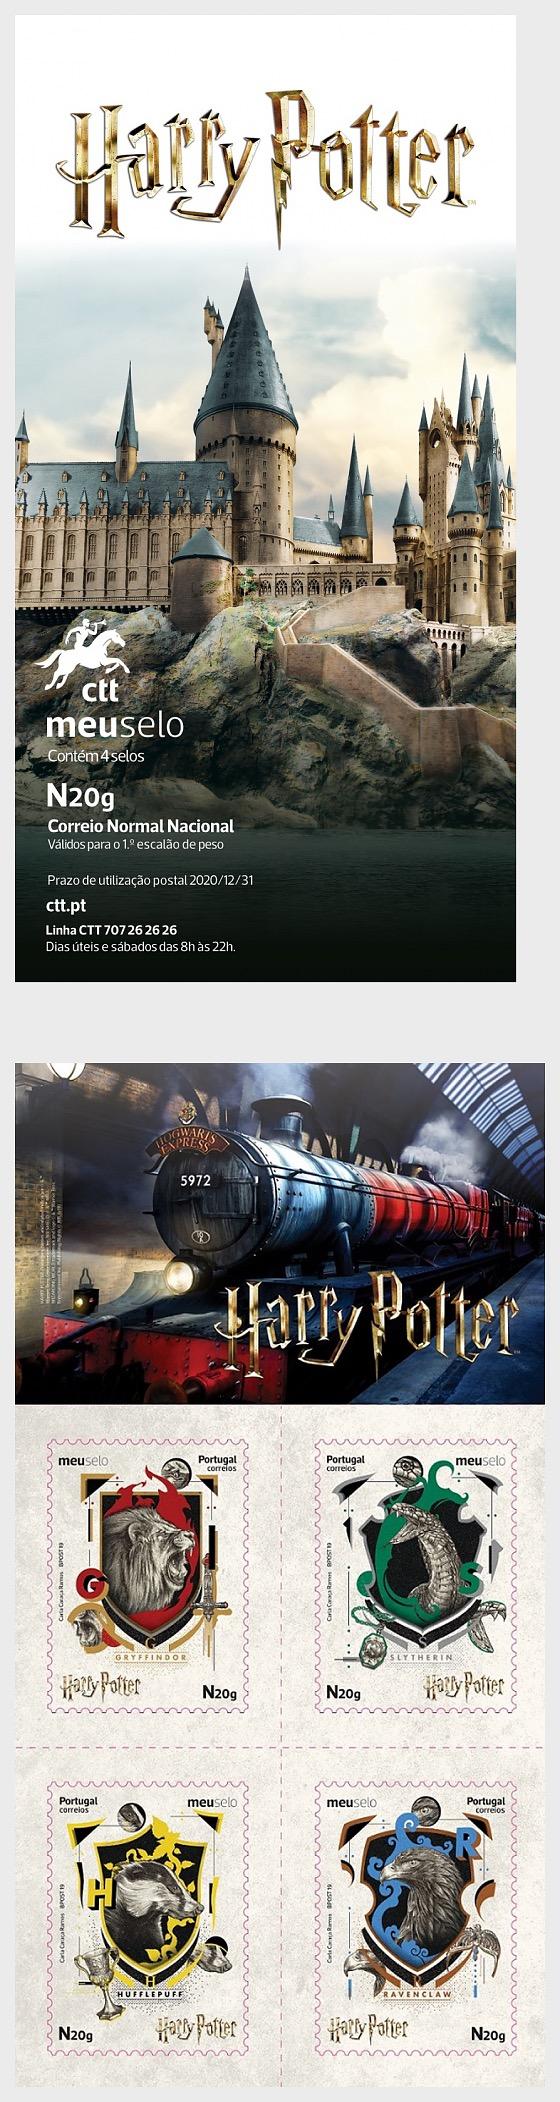 Harry Potter - Collezionabile